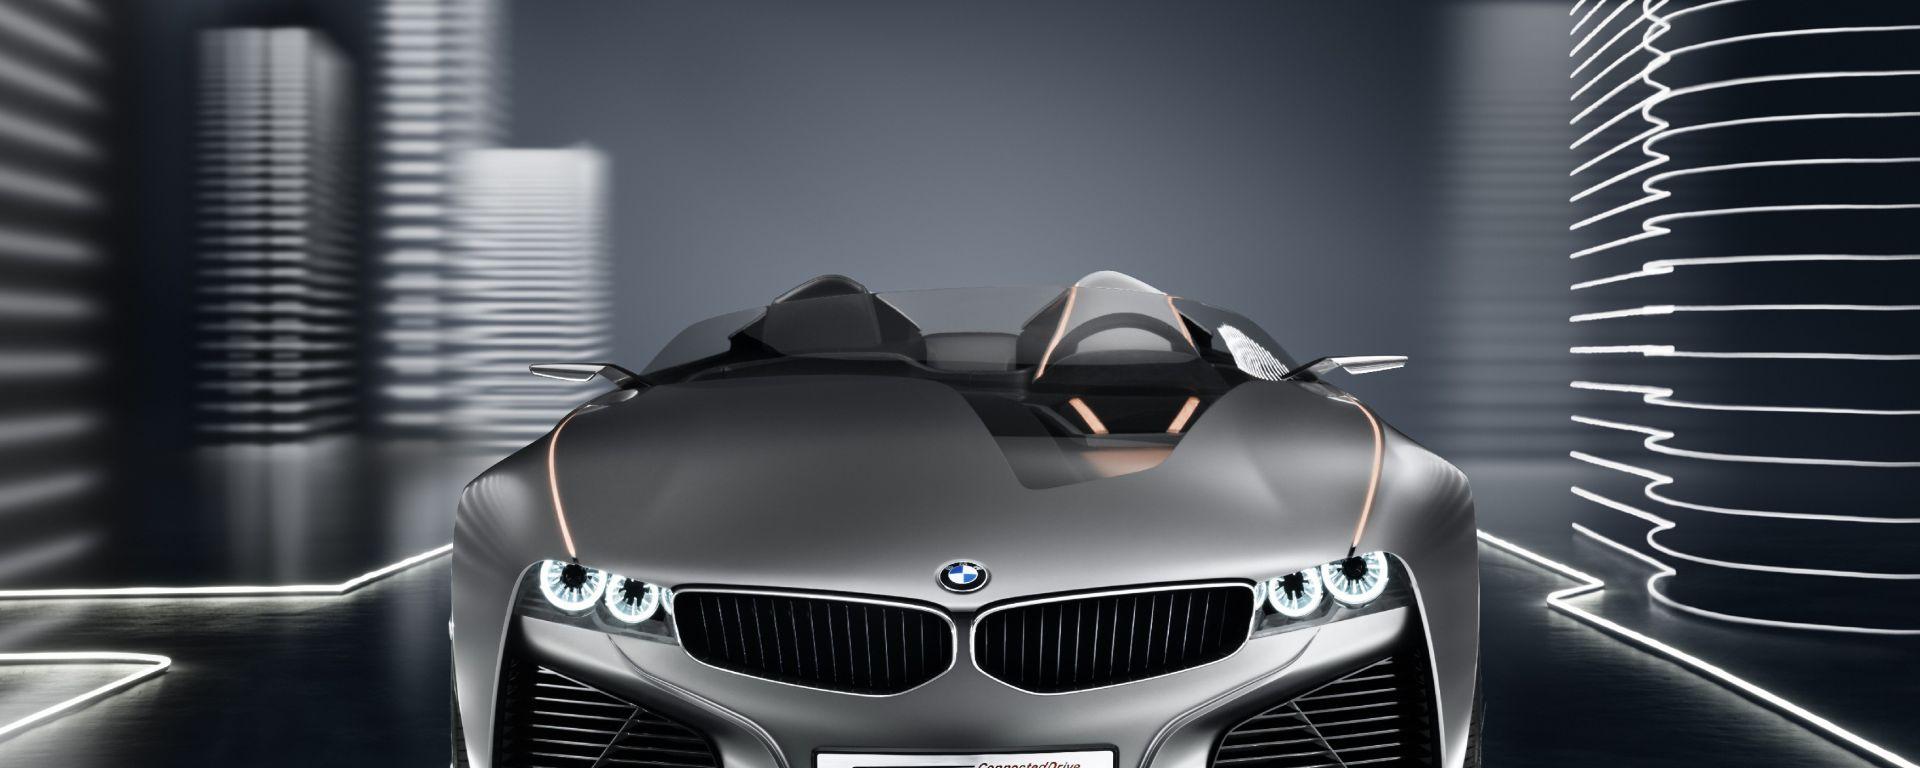 BMW Vision ConnectedDrive in dettaglio